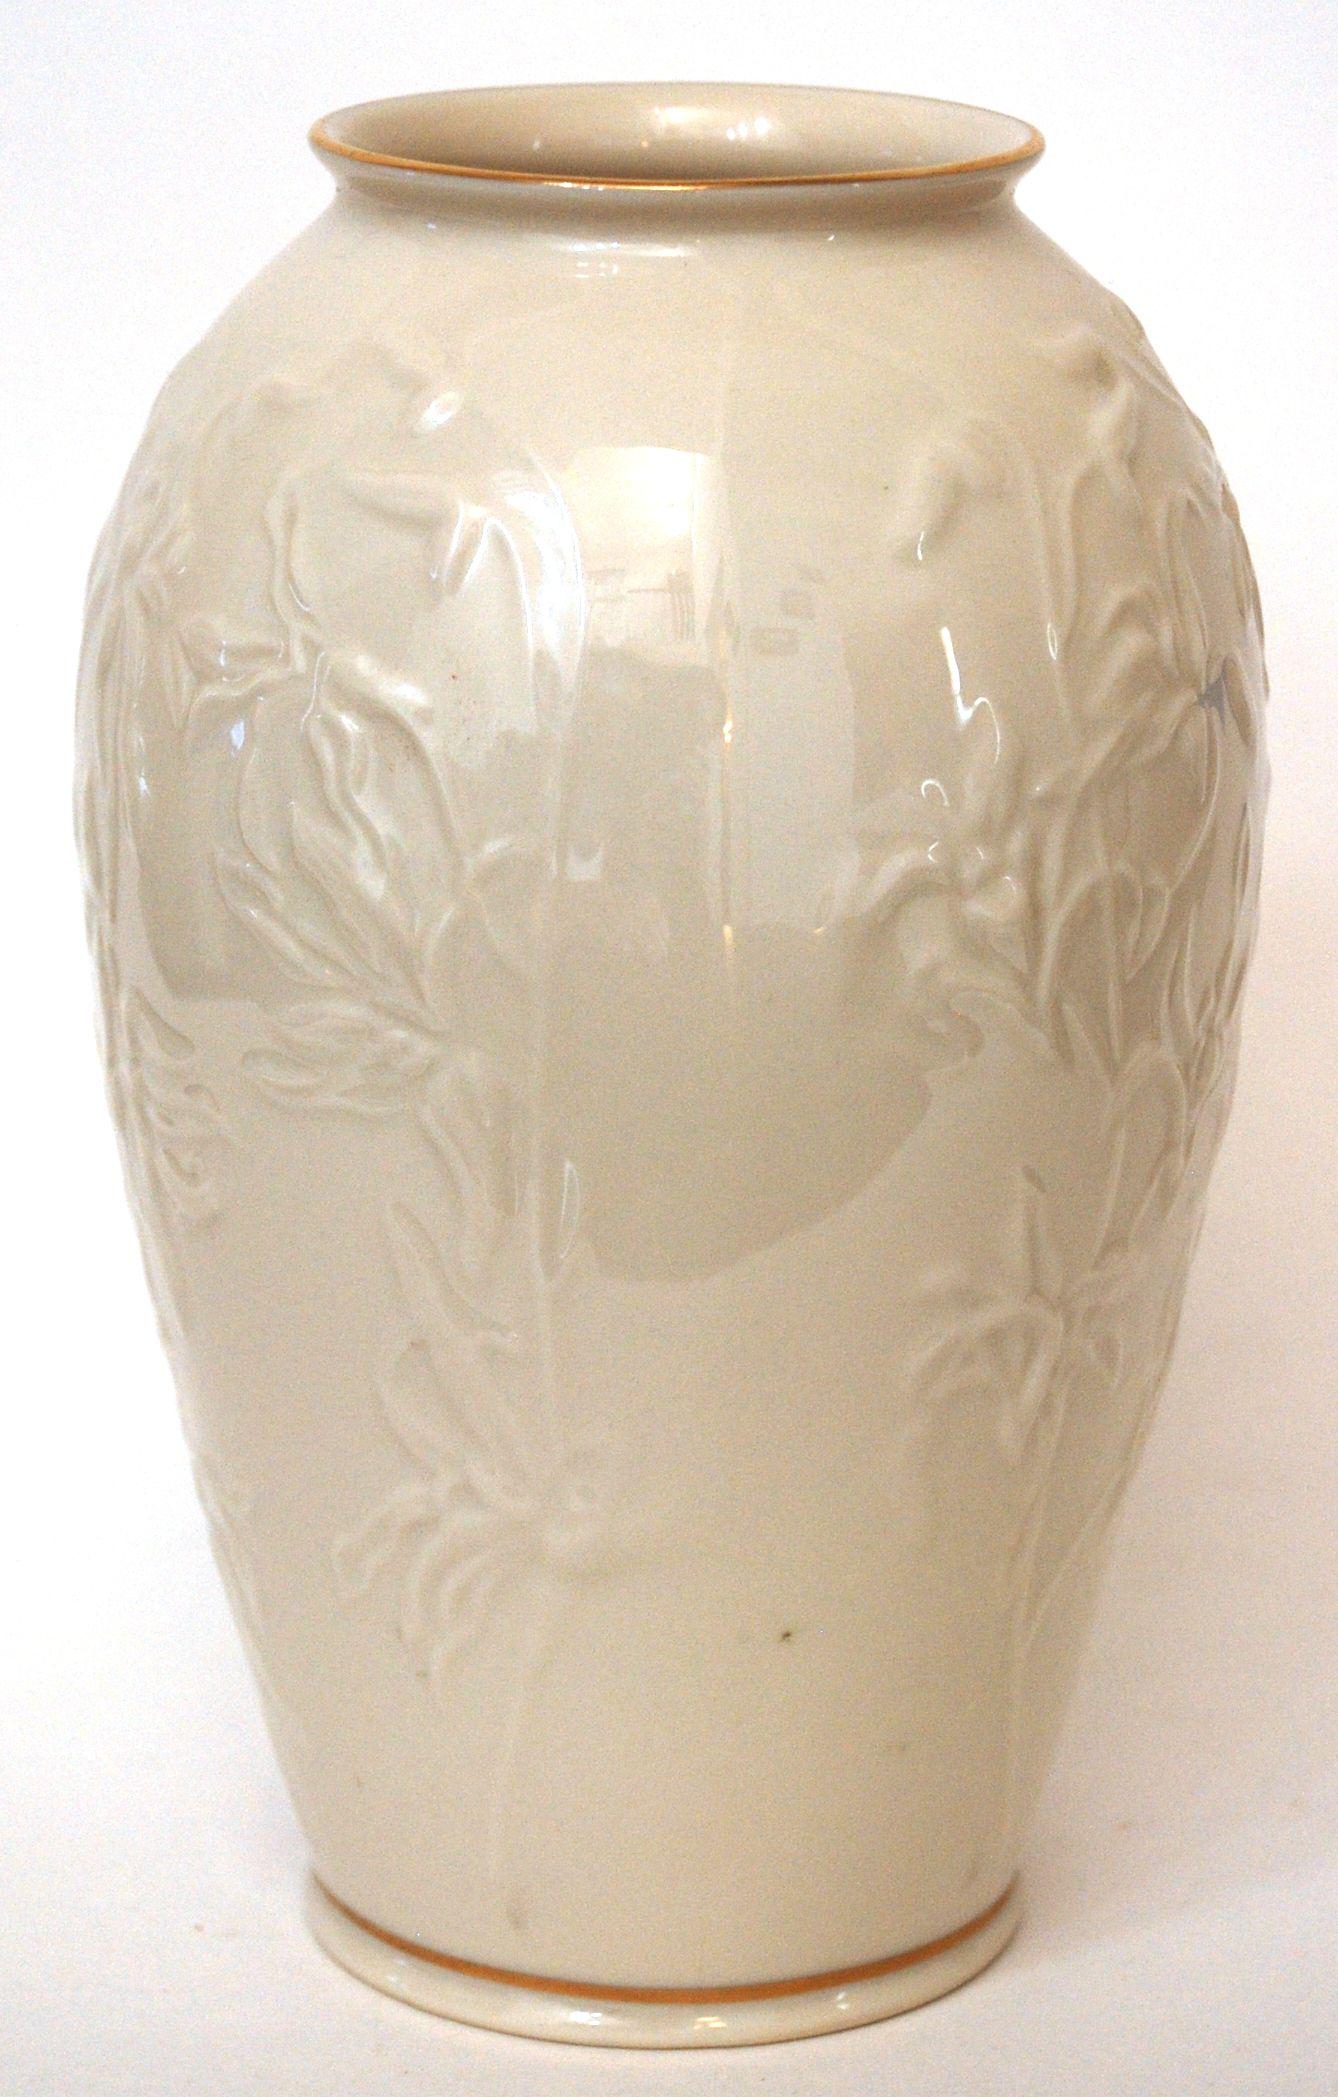 Lenox vases lenox porcelain vase vases pinterest lenox vases lenox porcelain vase floridaeventfo Image collections